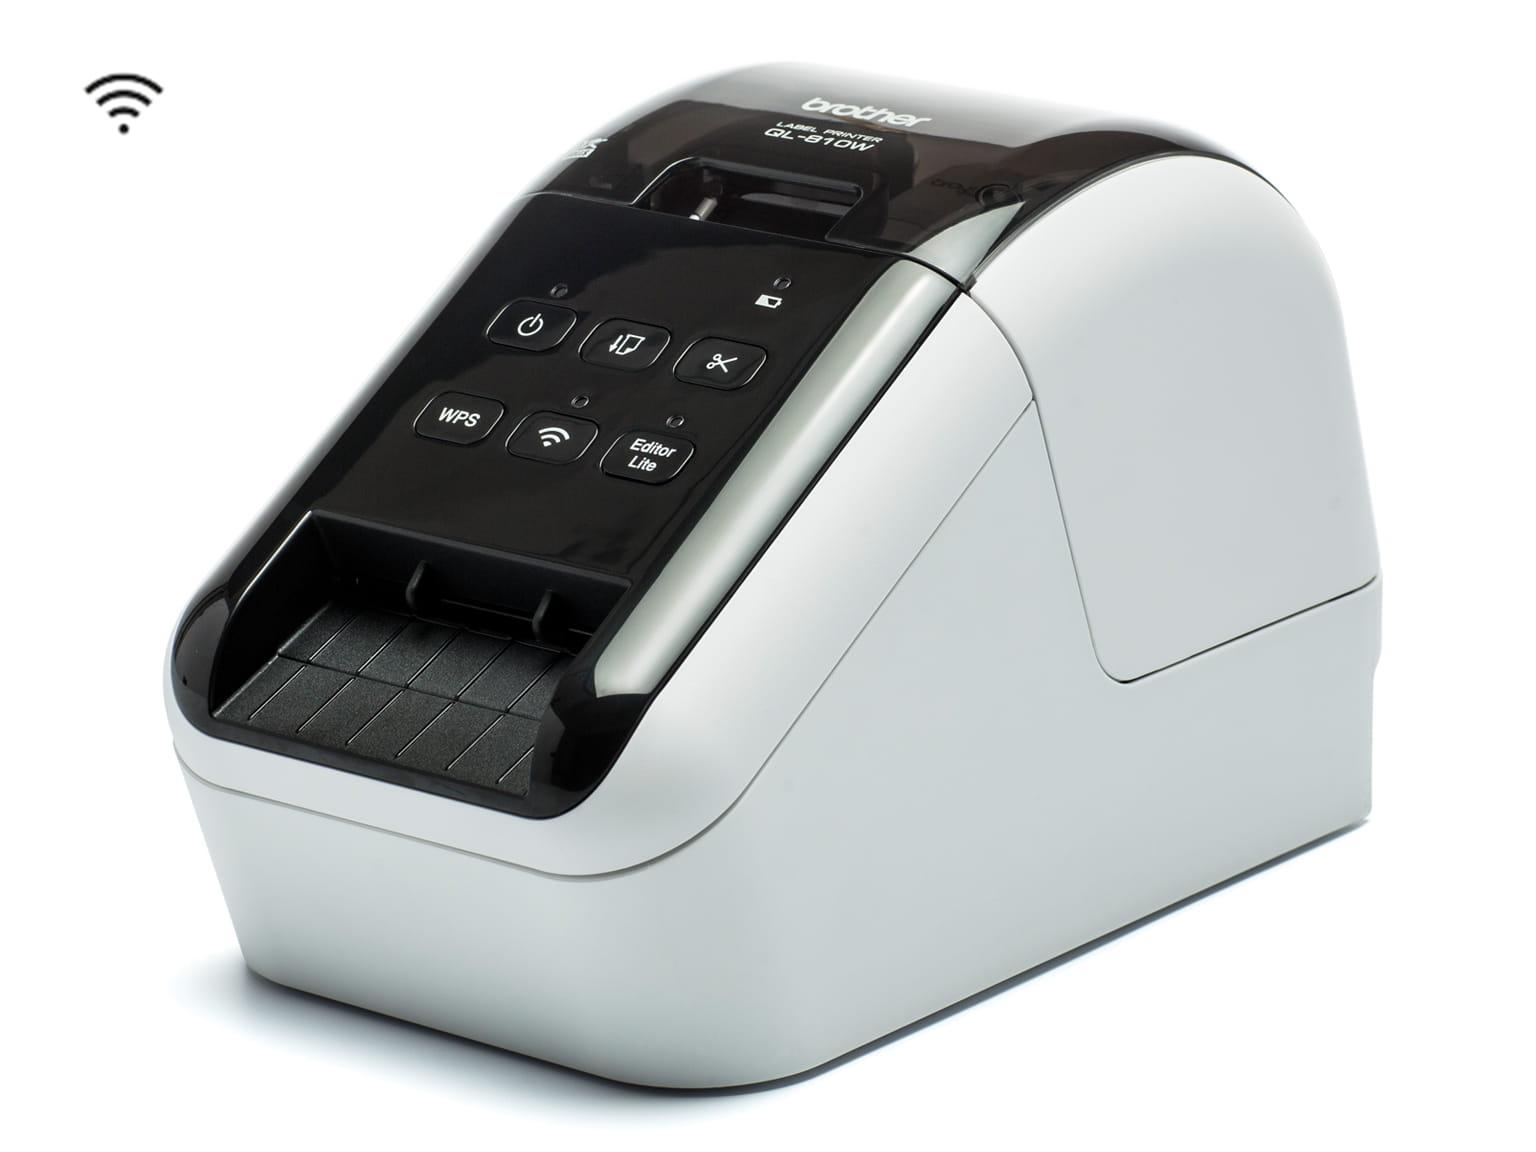 QL-810W Brother Label Printer